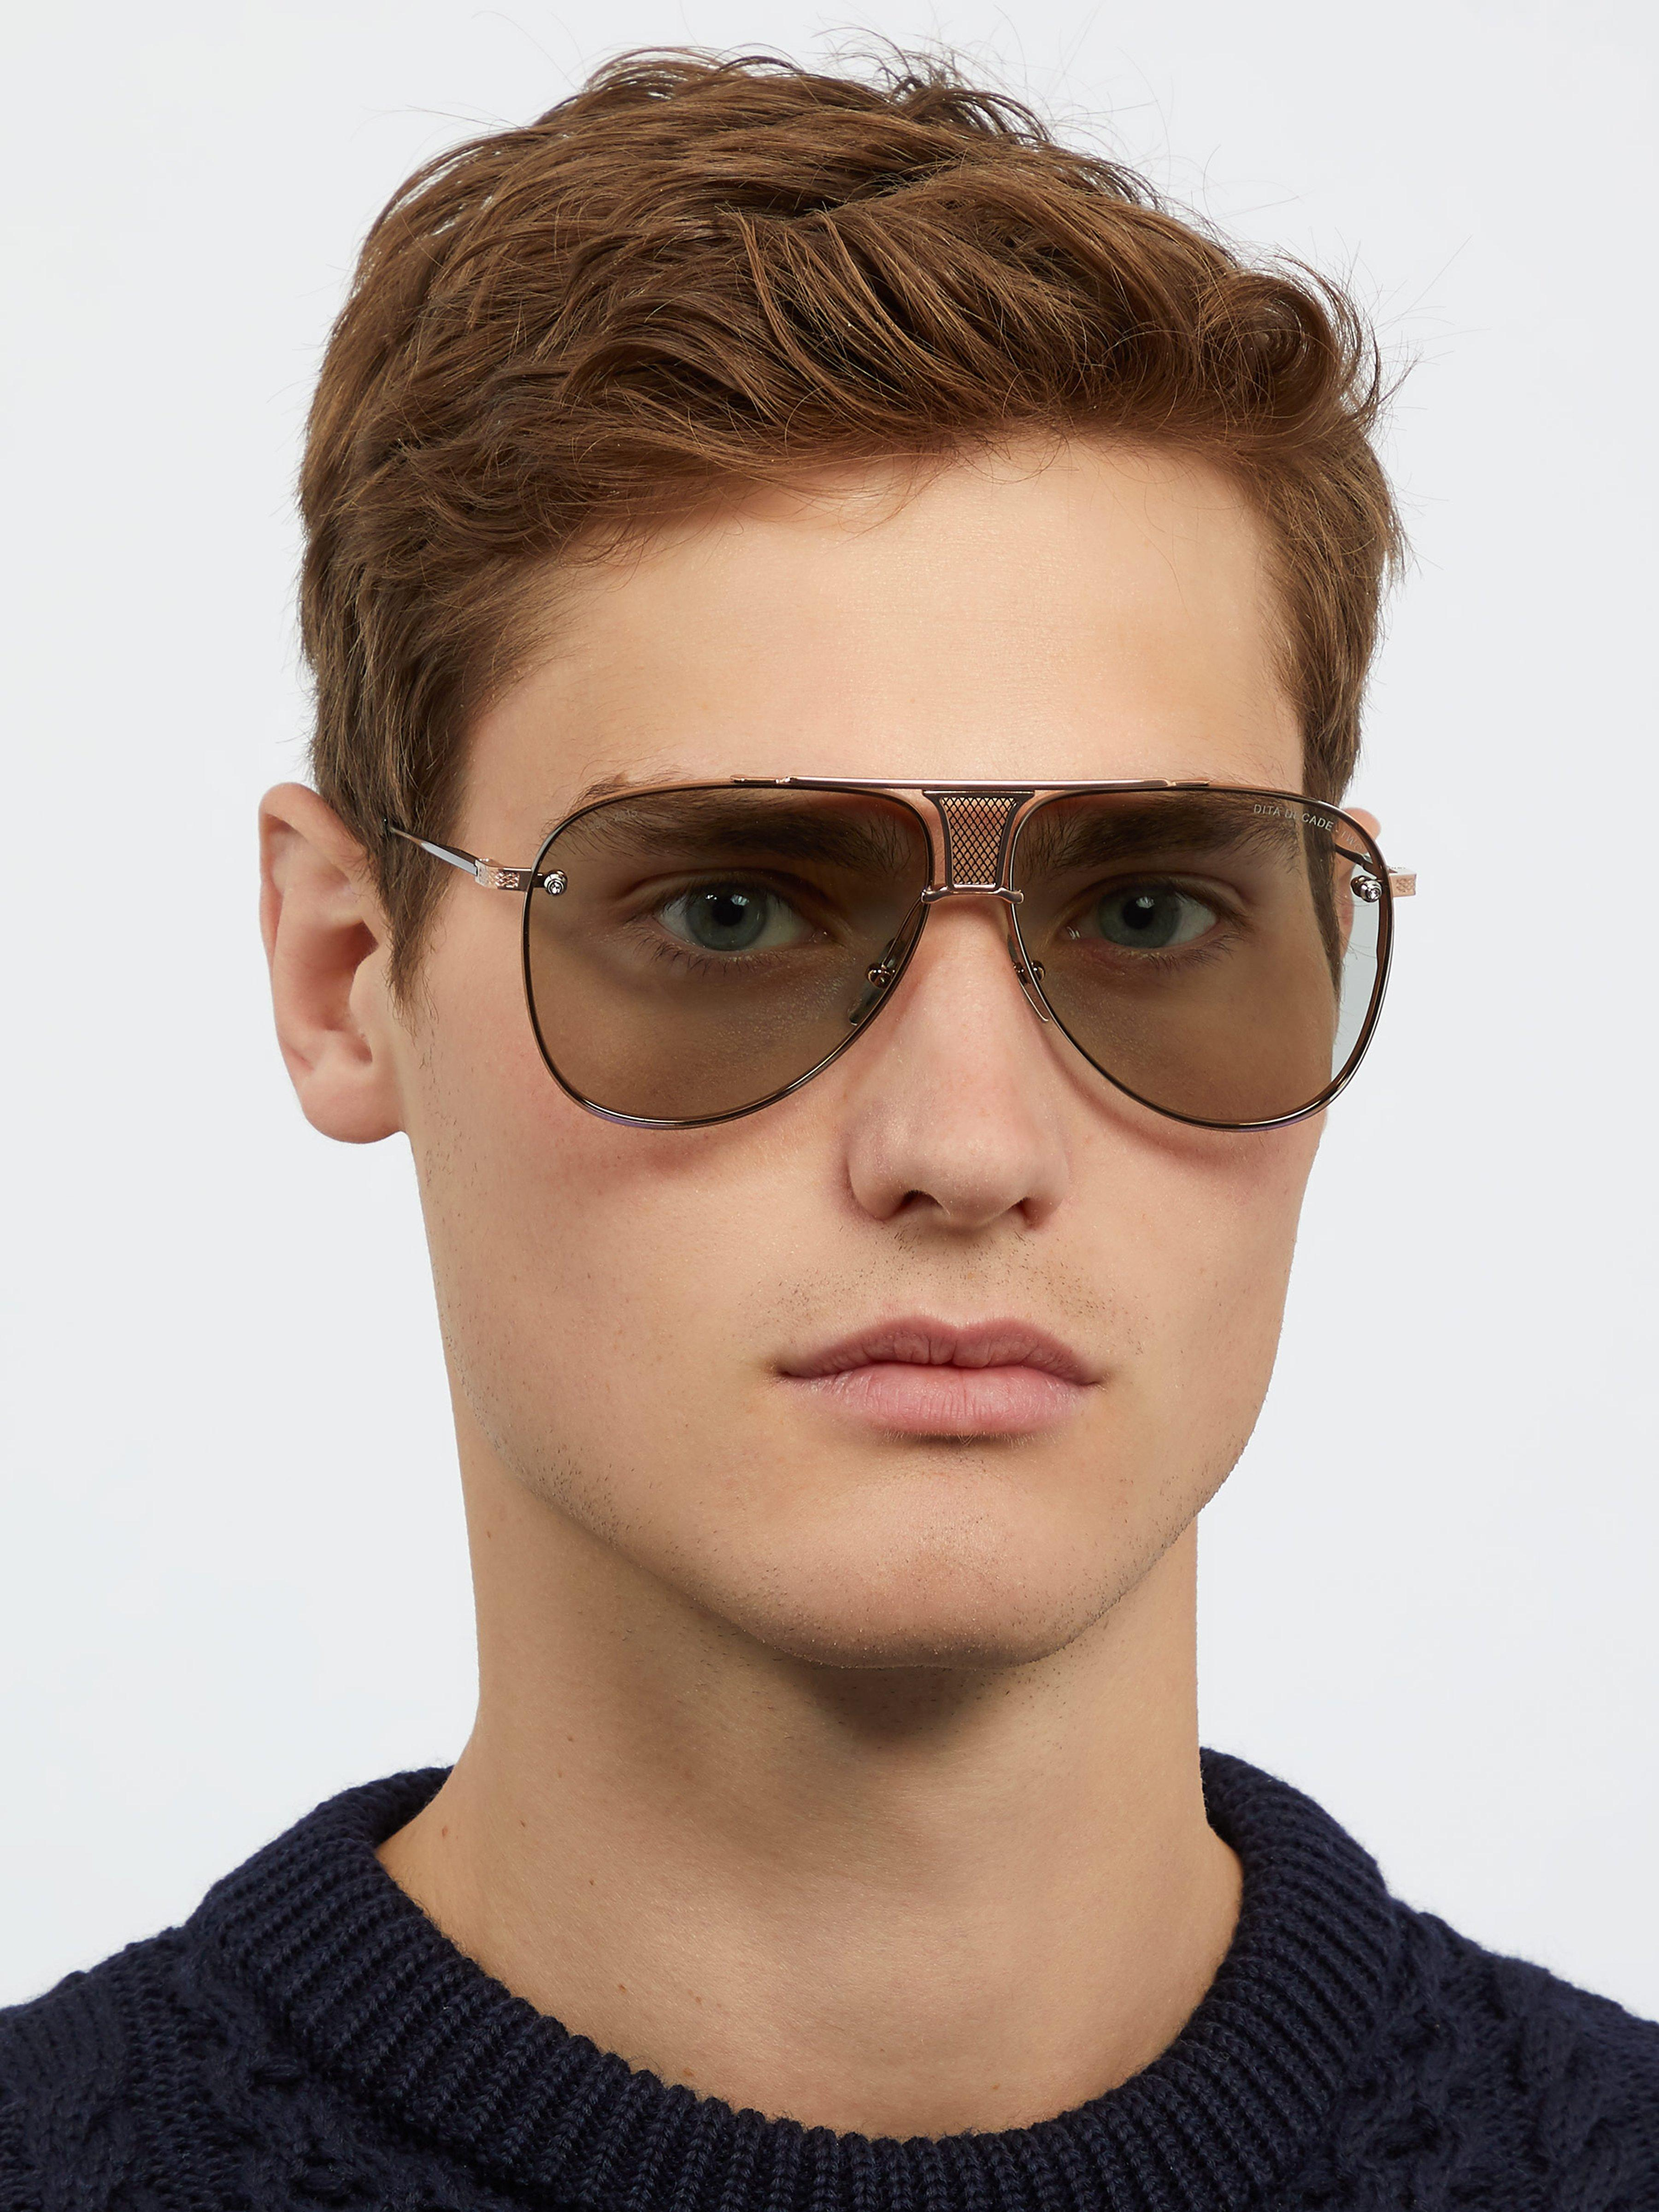 Dita Eyewear Decade Two Aviator Titanium Sunglasses in Gold (Metallic) for Men